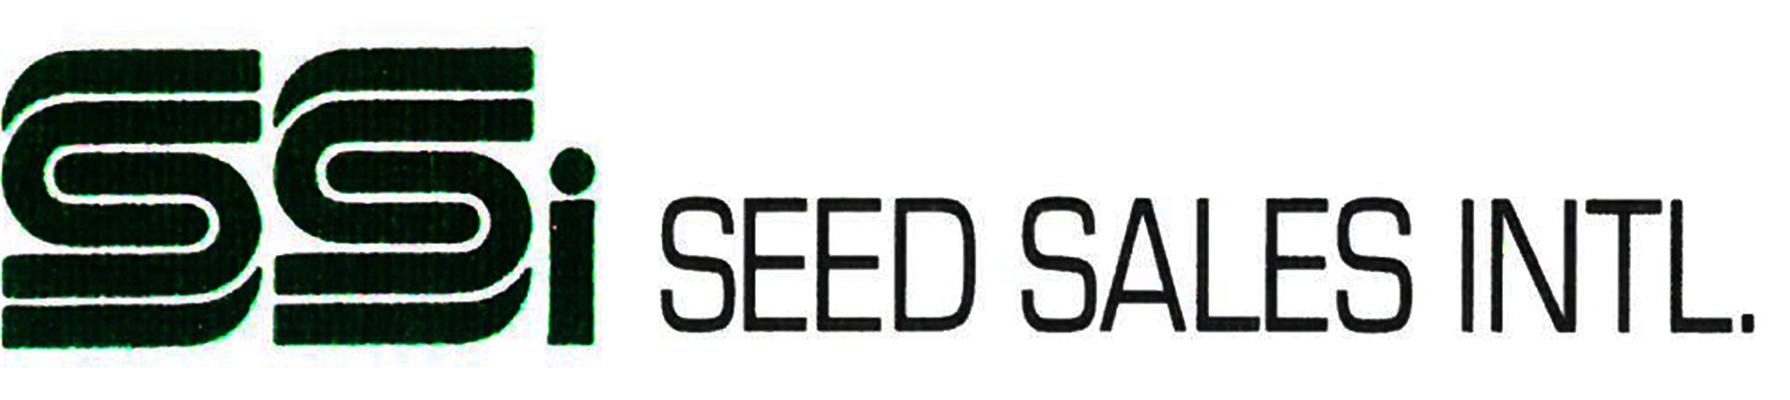 Seed Sales International